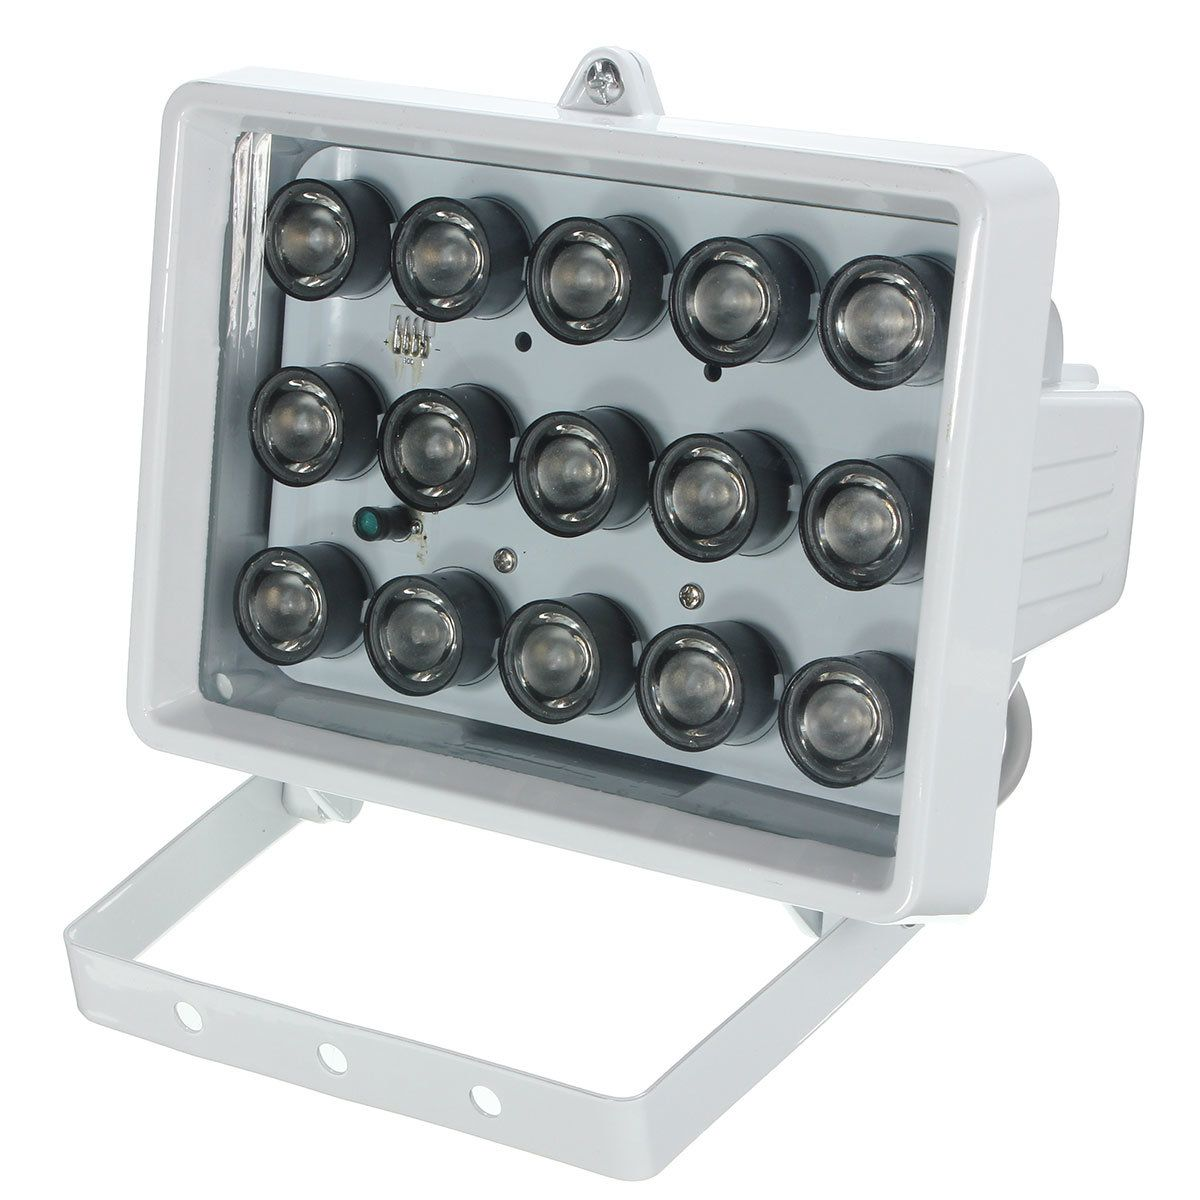 328ft 15led 12v night vision lamp ir illuminator infrared light for 328ft 15led 12v night vision lamp ir illuminator infrared light for security camera aloadofball Images